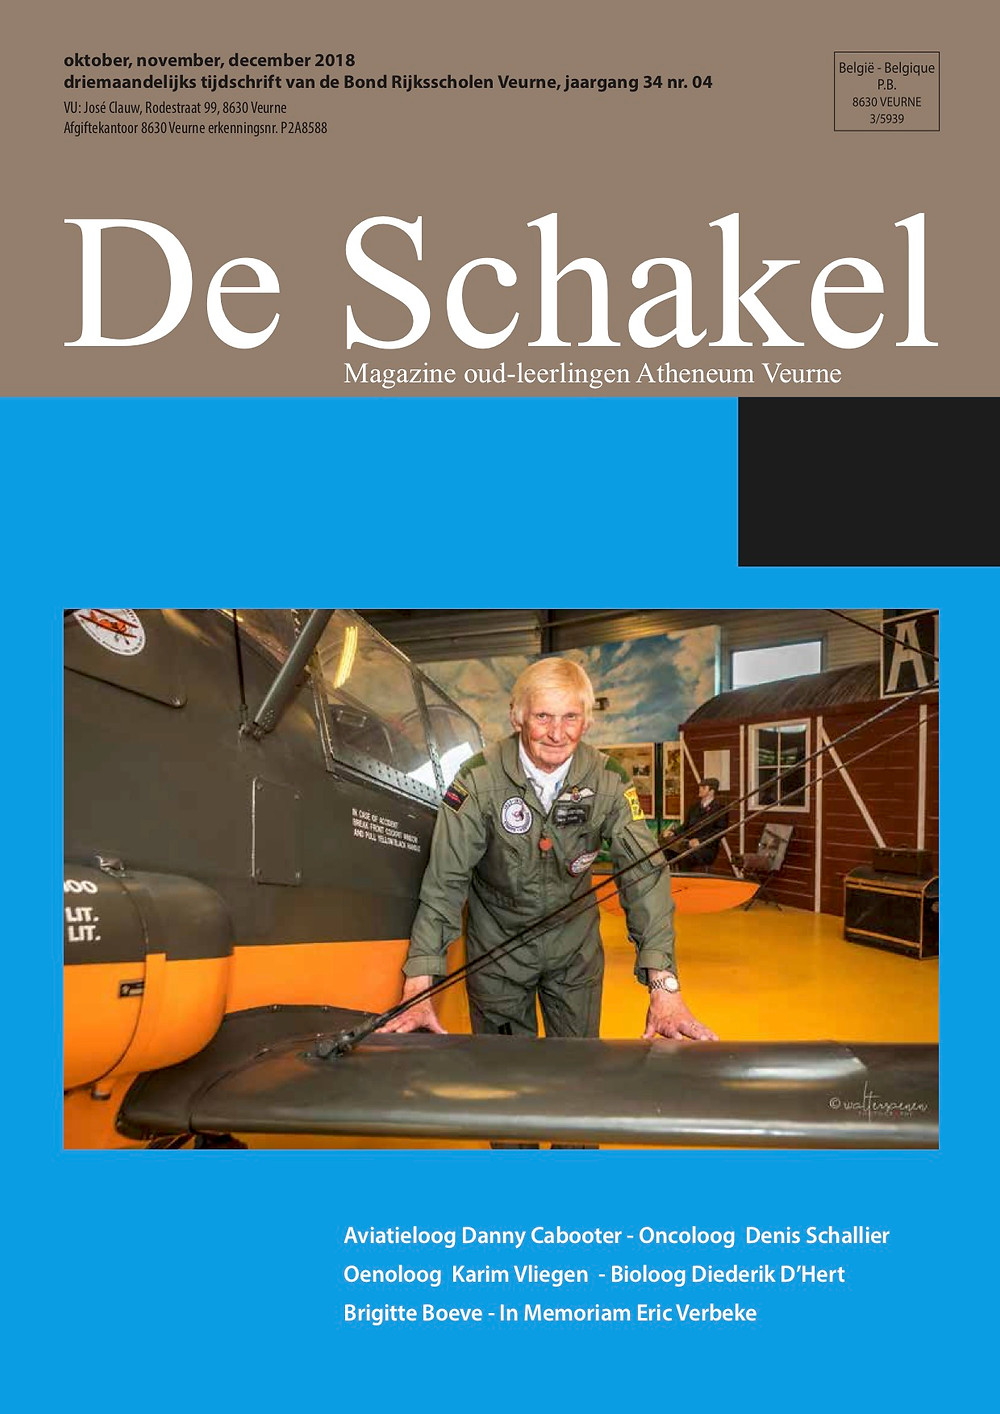 cover de schakel editie december 2018 bond atheneum Veurne